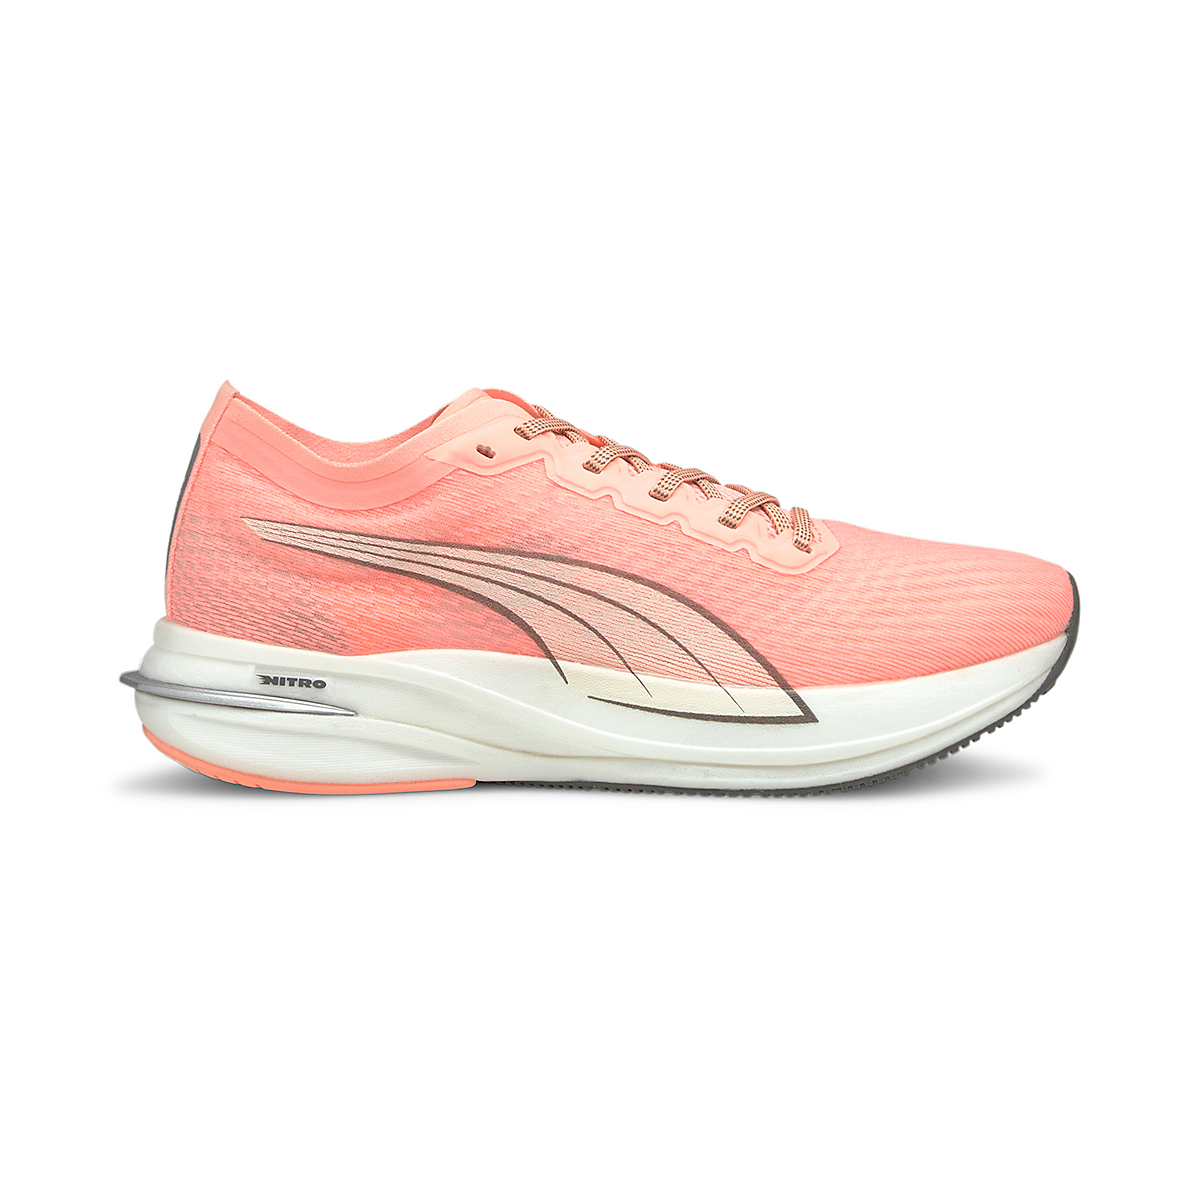 Women's Puma Deviate Nitro Running Shoe - Color: Elektro Peach - Size: 5.5 - Width: Regular, Elektro Peach, large, image 1